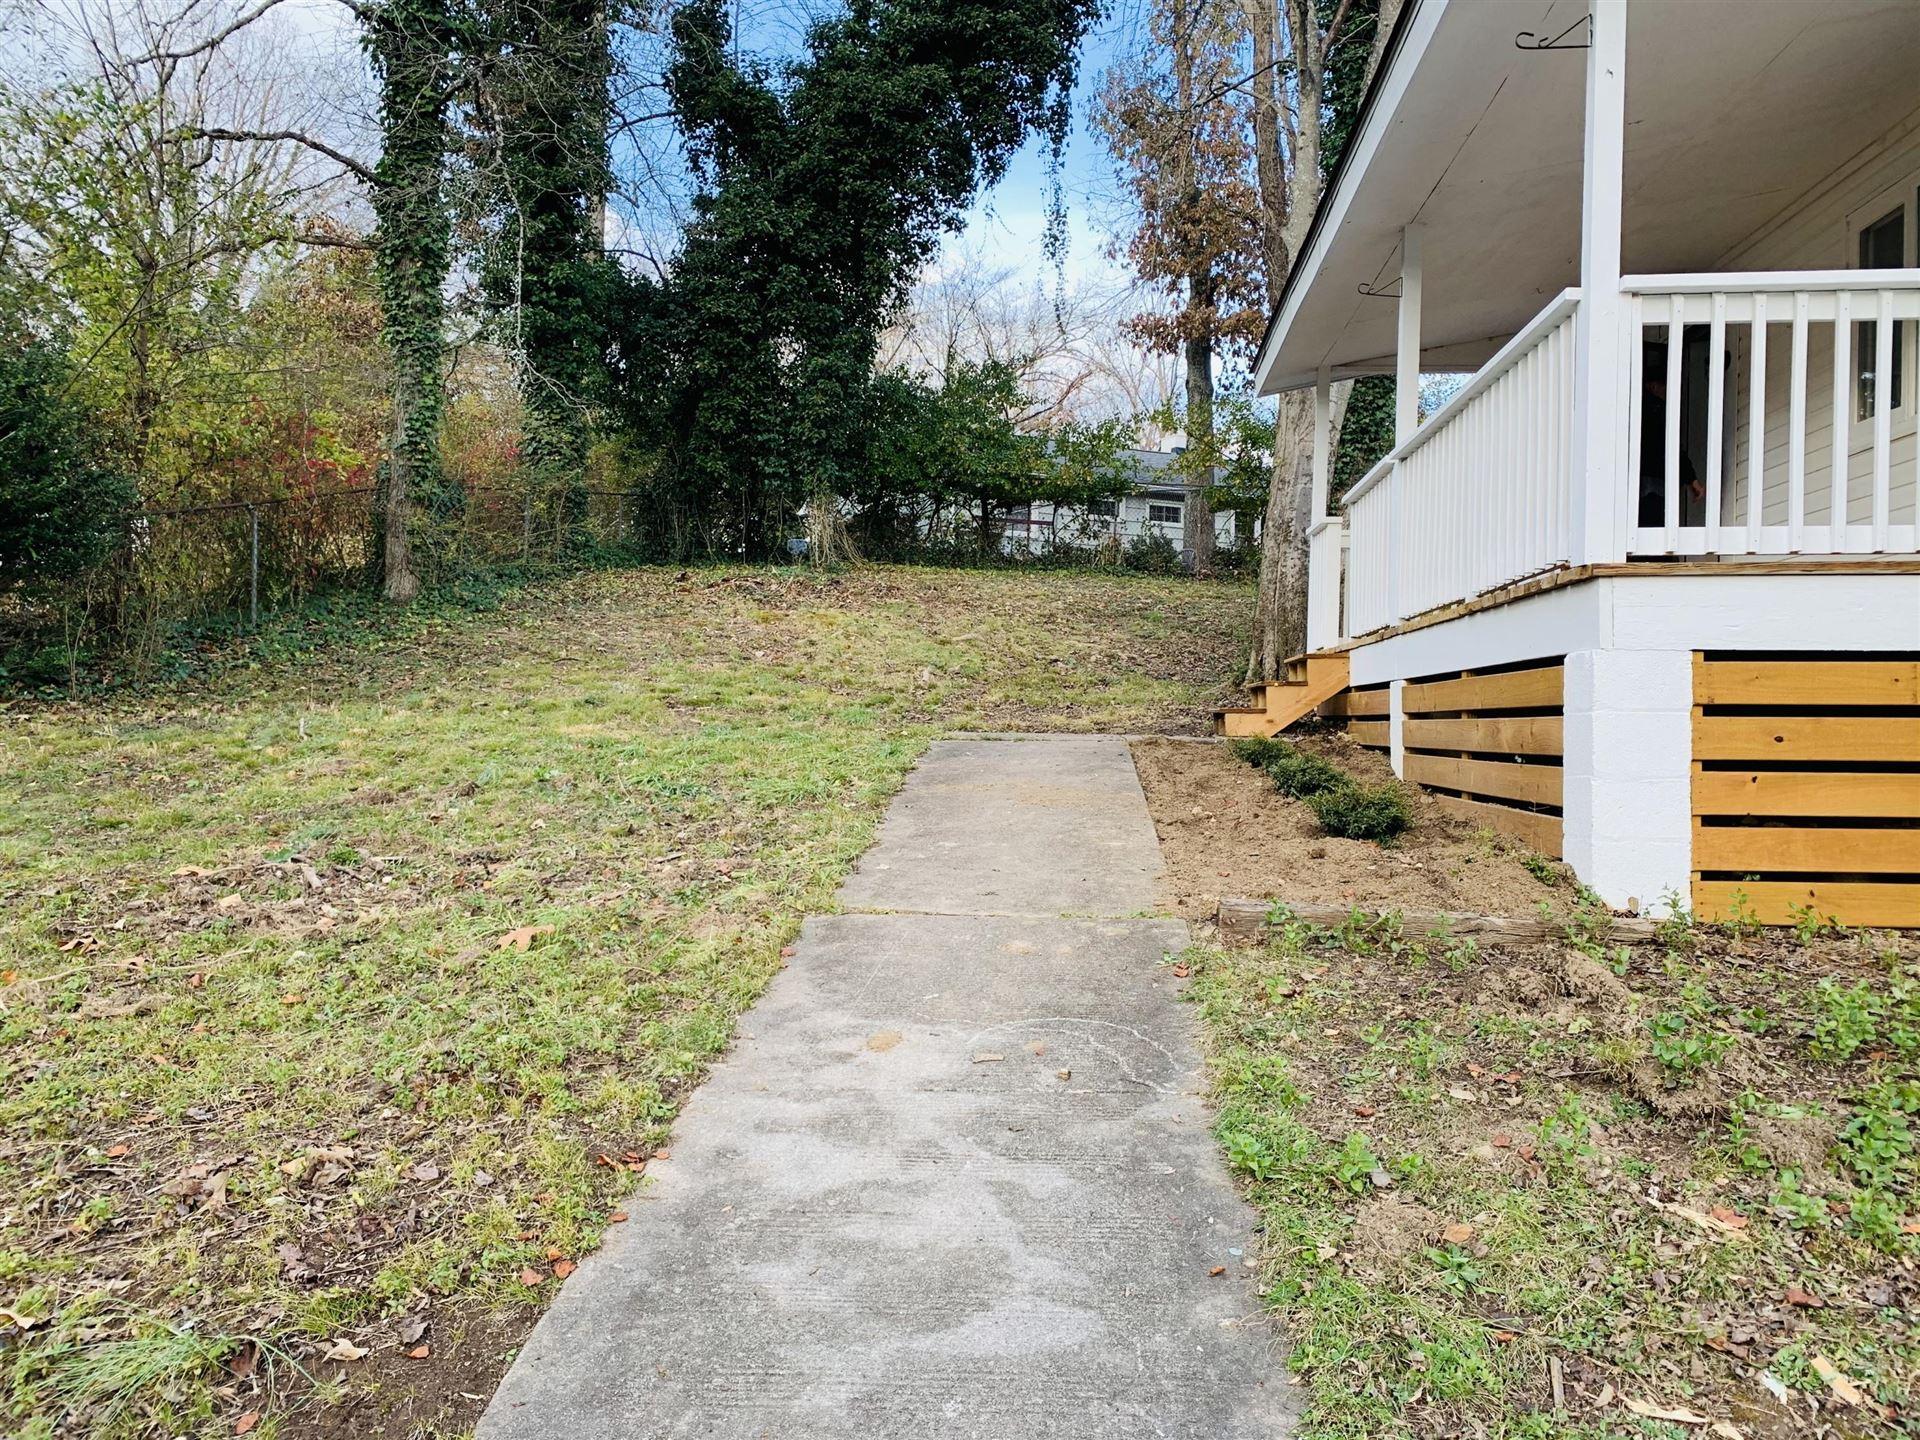 Photo of 606 Florida Ave, Oak Ridge, TN 37830 (MLS # 1138856)